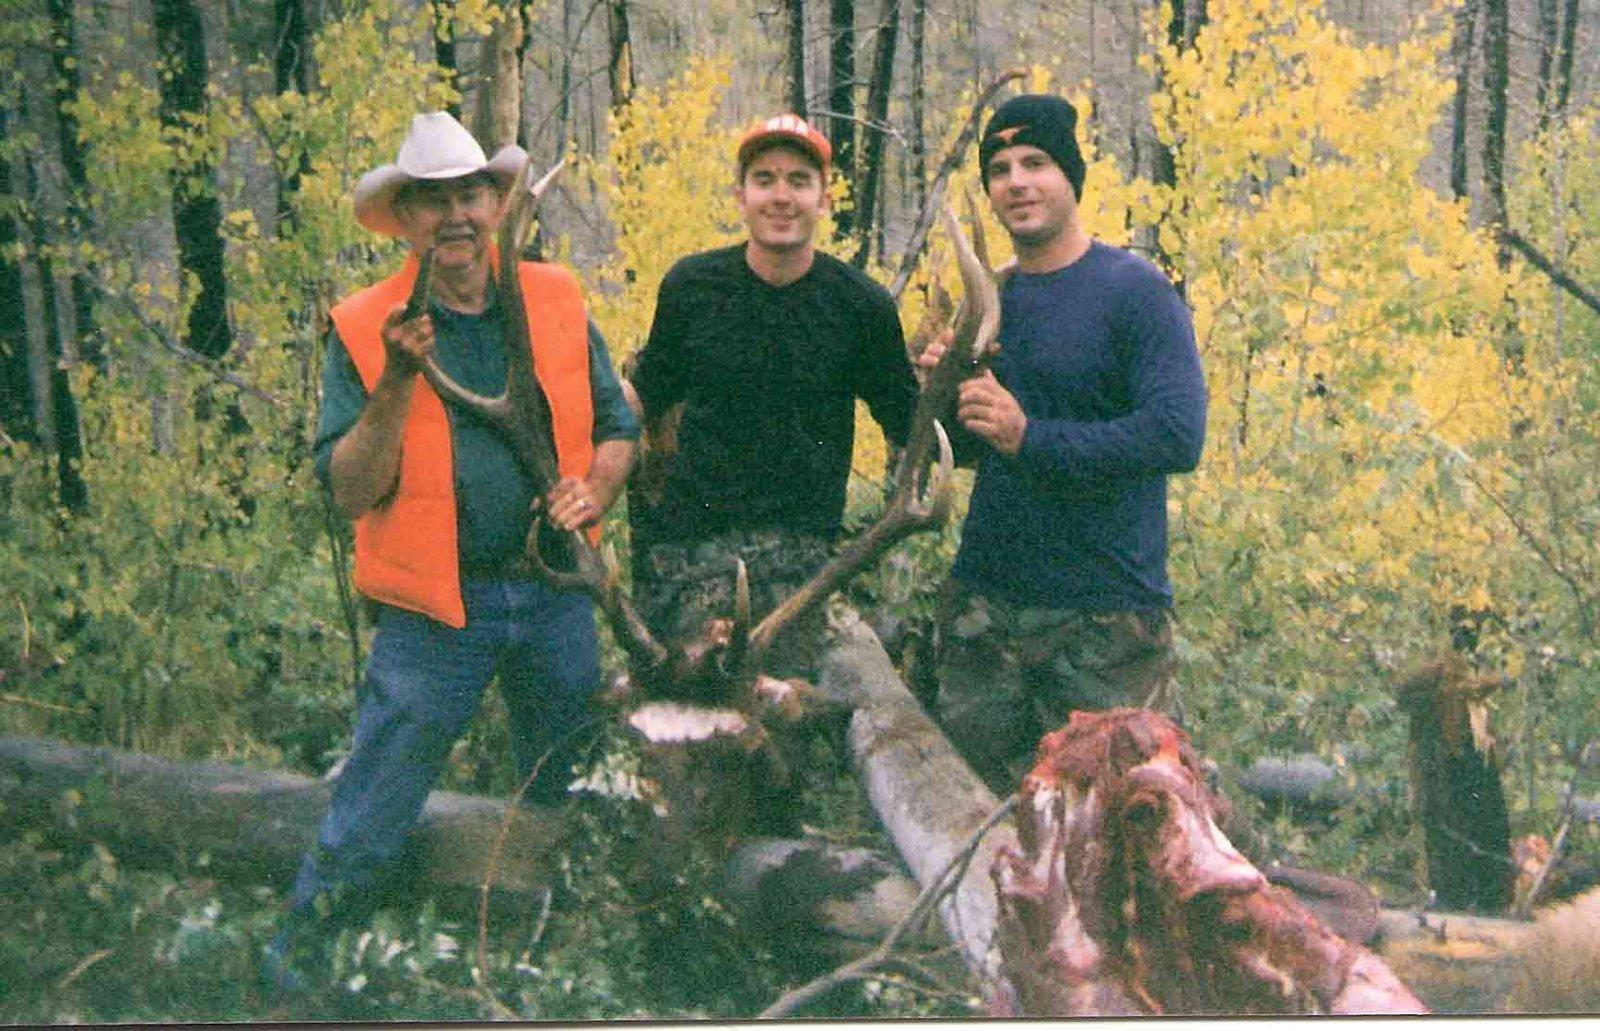 Carothers got a elk